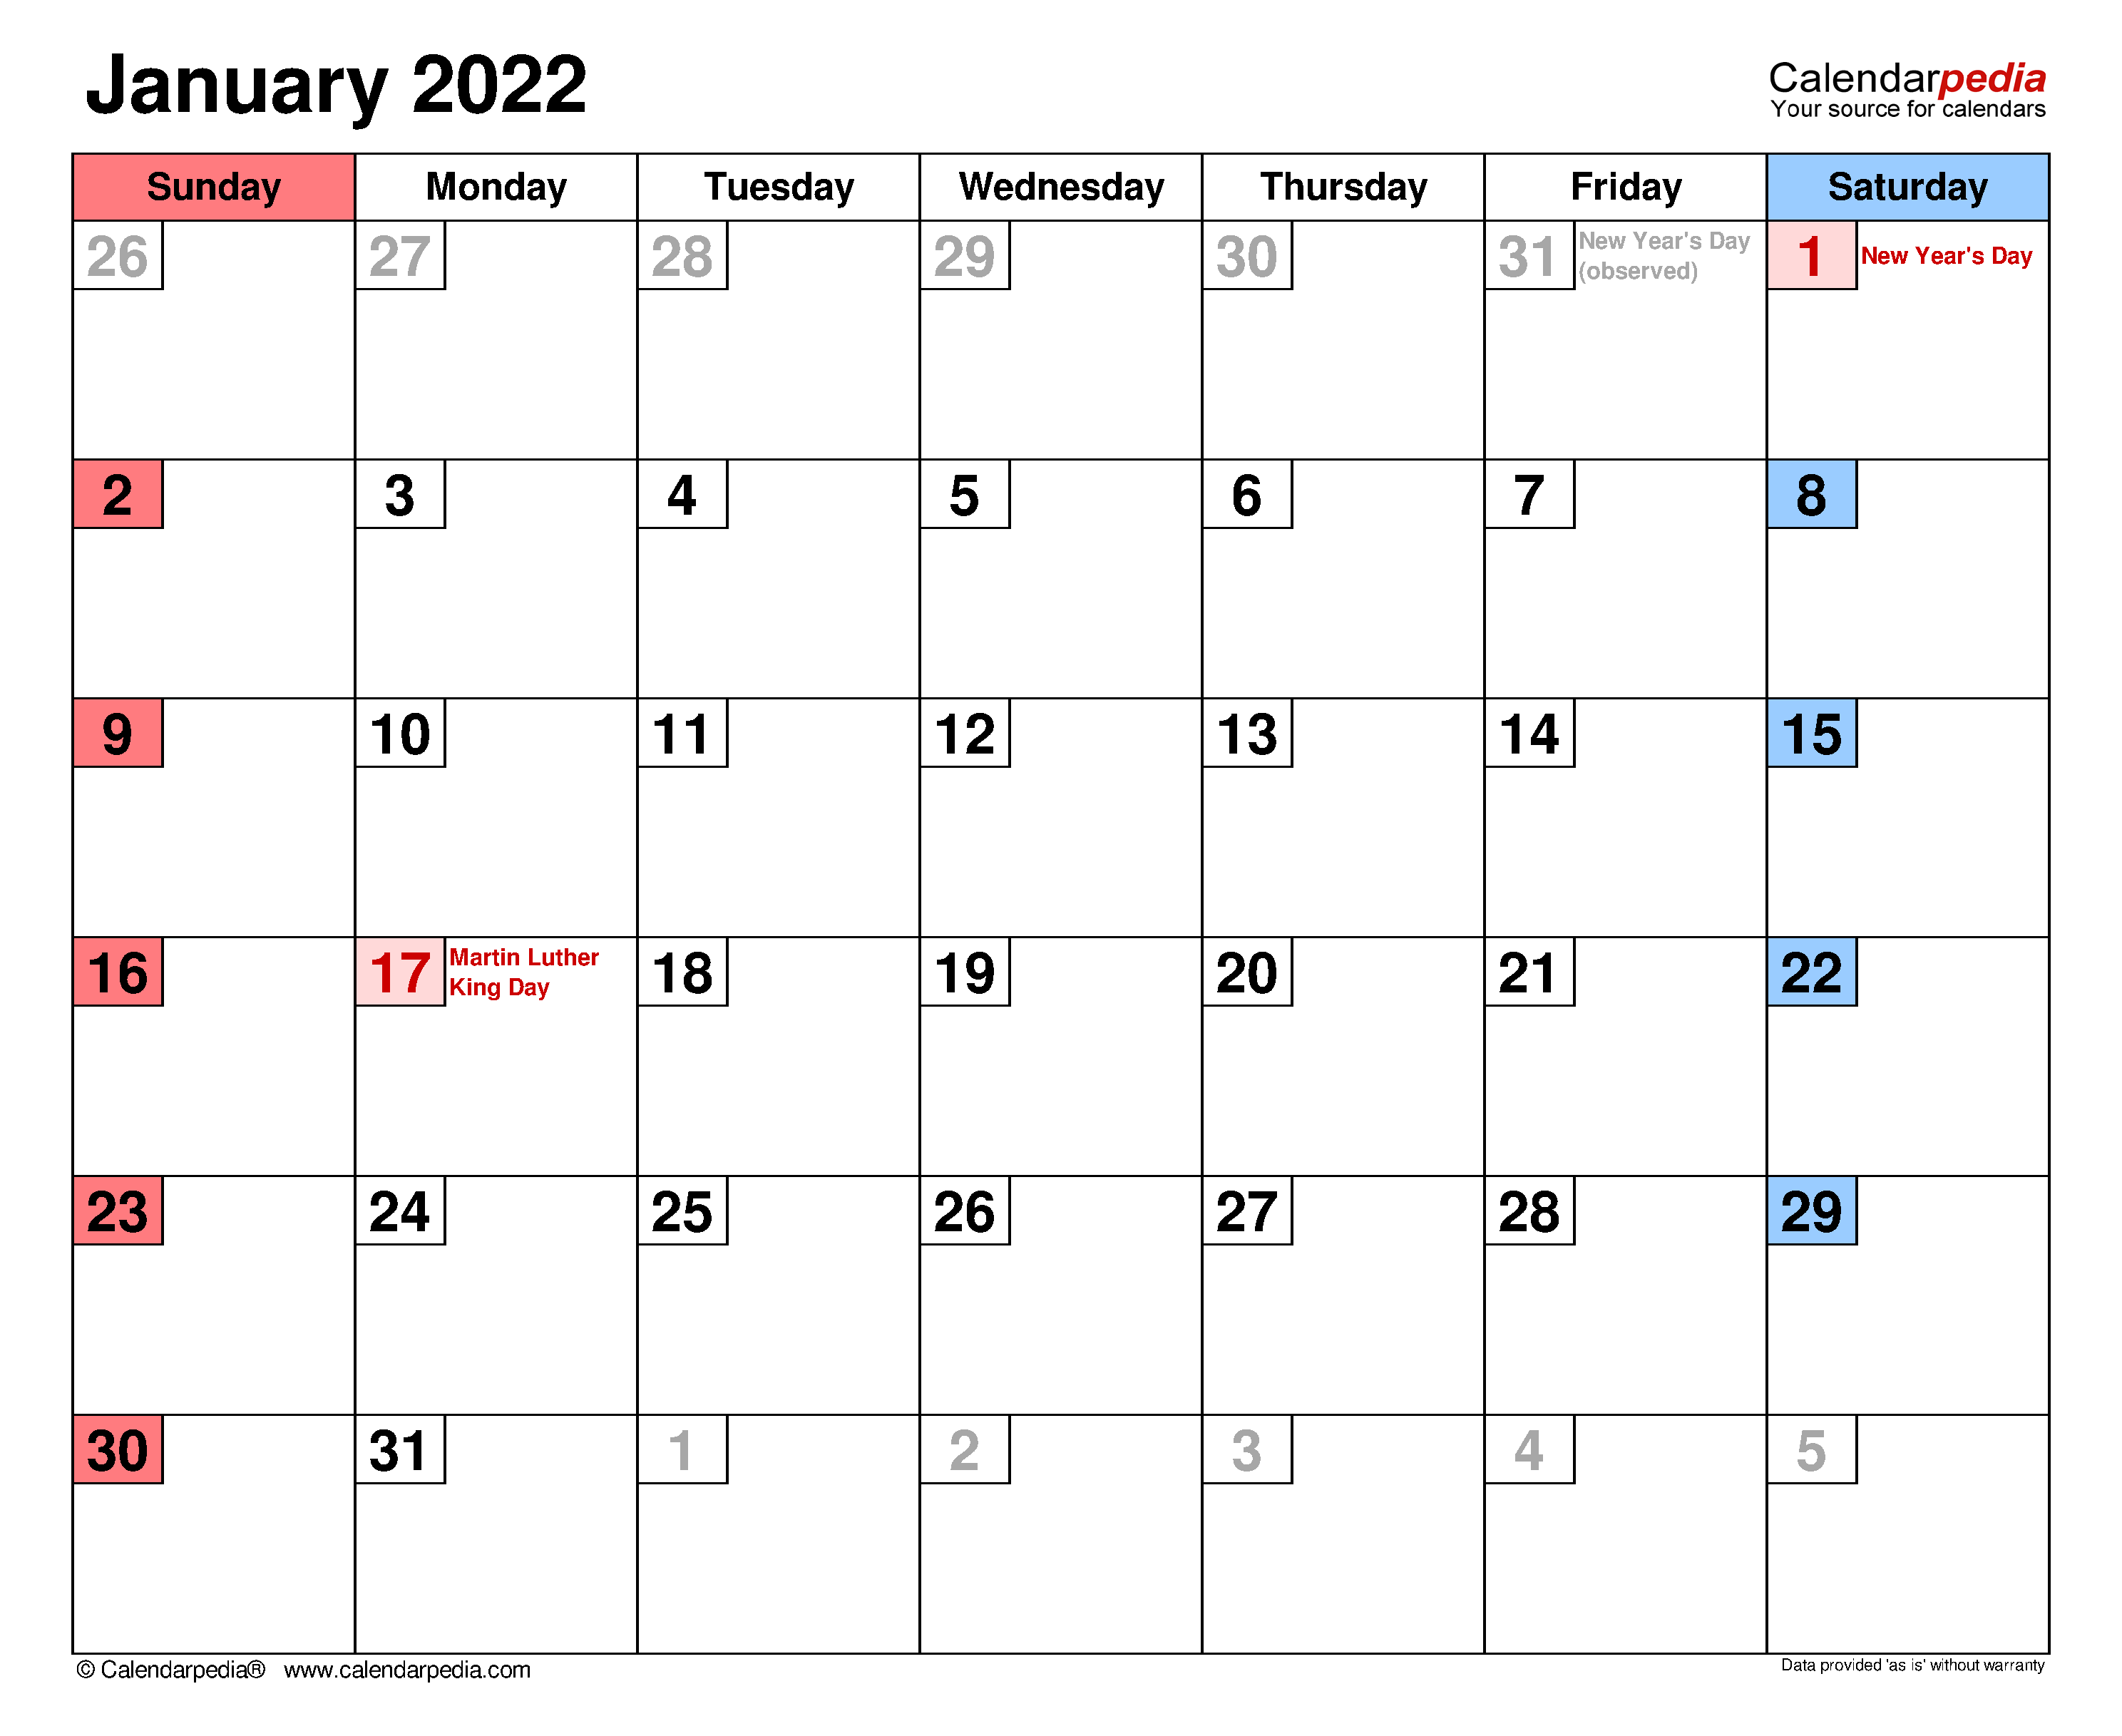 January 2022 Calendar | Templates For Word, Excel And Pdf Regarding Printable Calendar January 2022